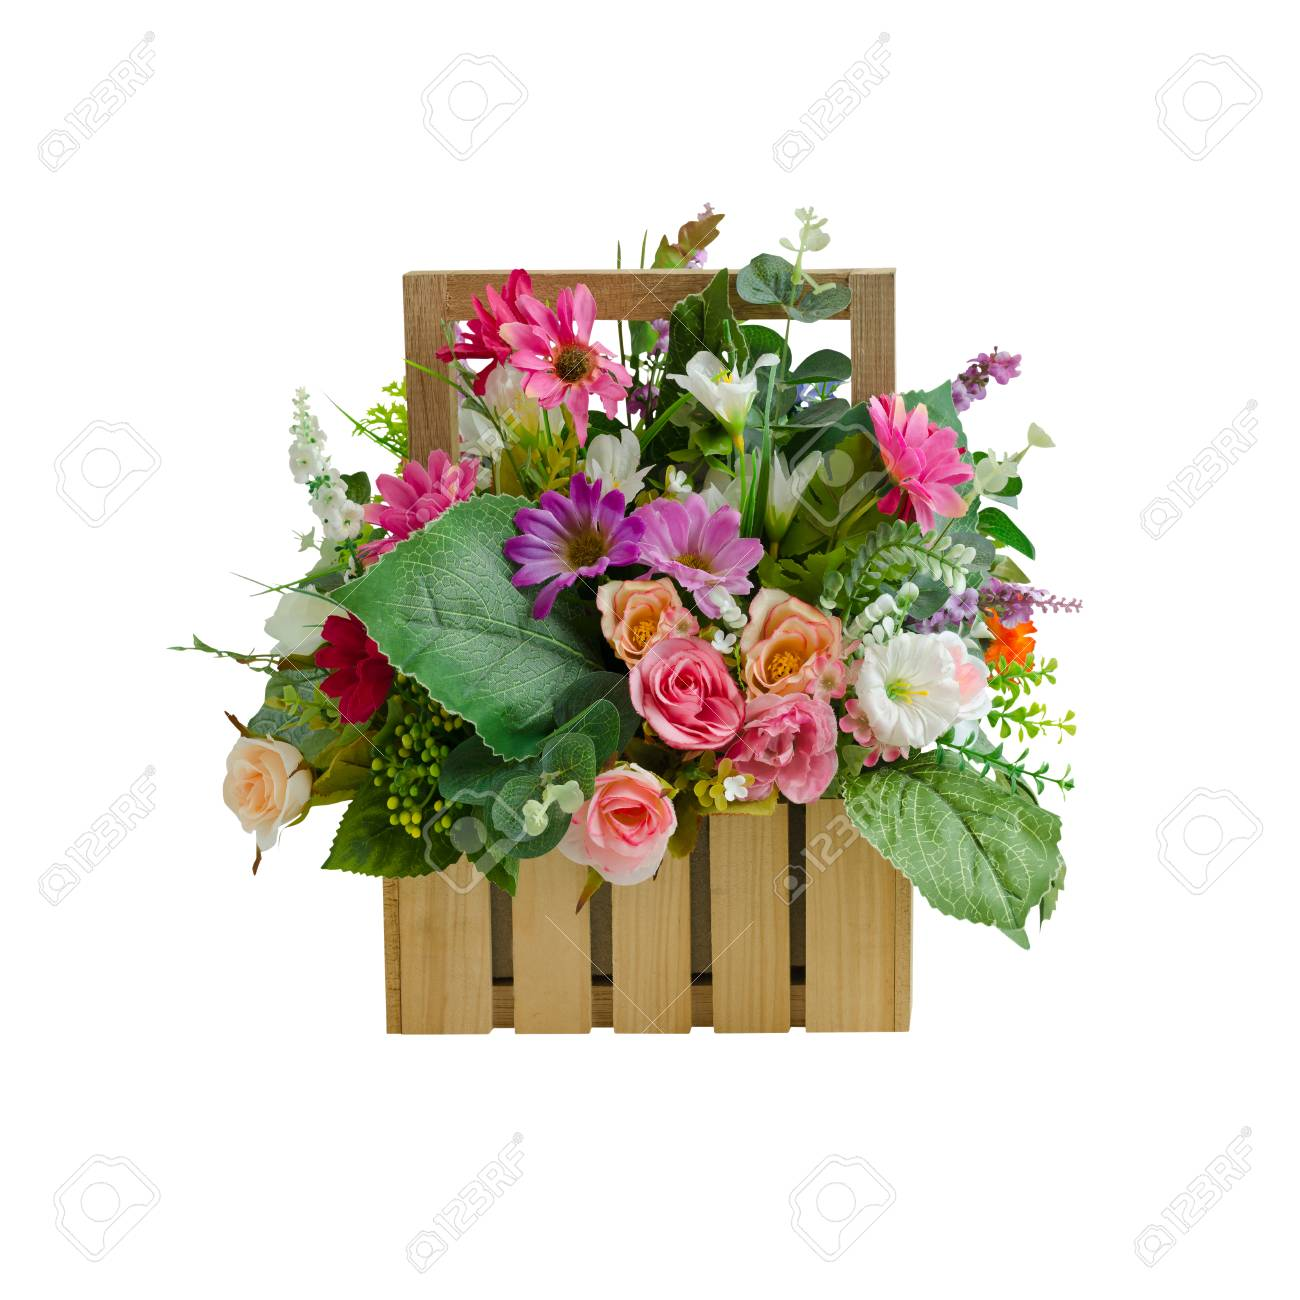 Colorful artificial flower basket decoration isolated on white with colorful artificial flower basket decoration isolated on white with working path stok fotoraf 88254926 mightylinksfo